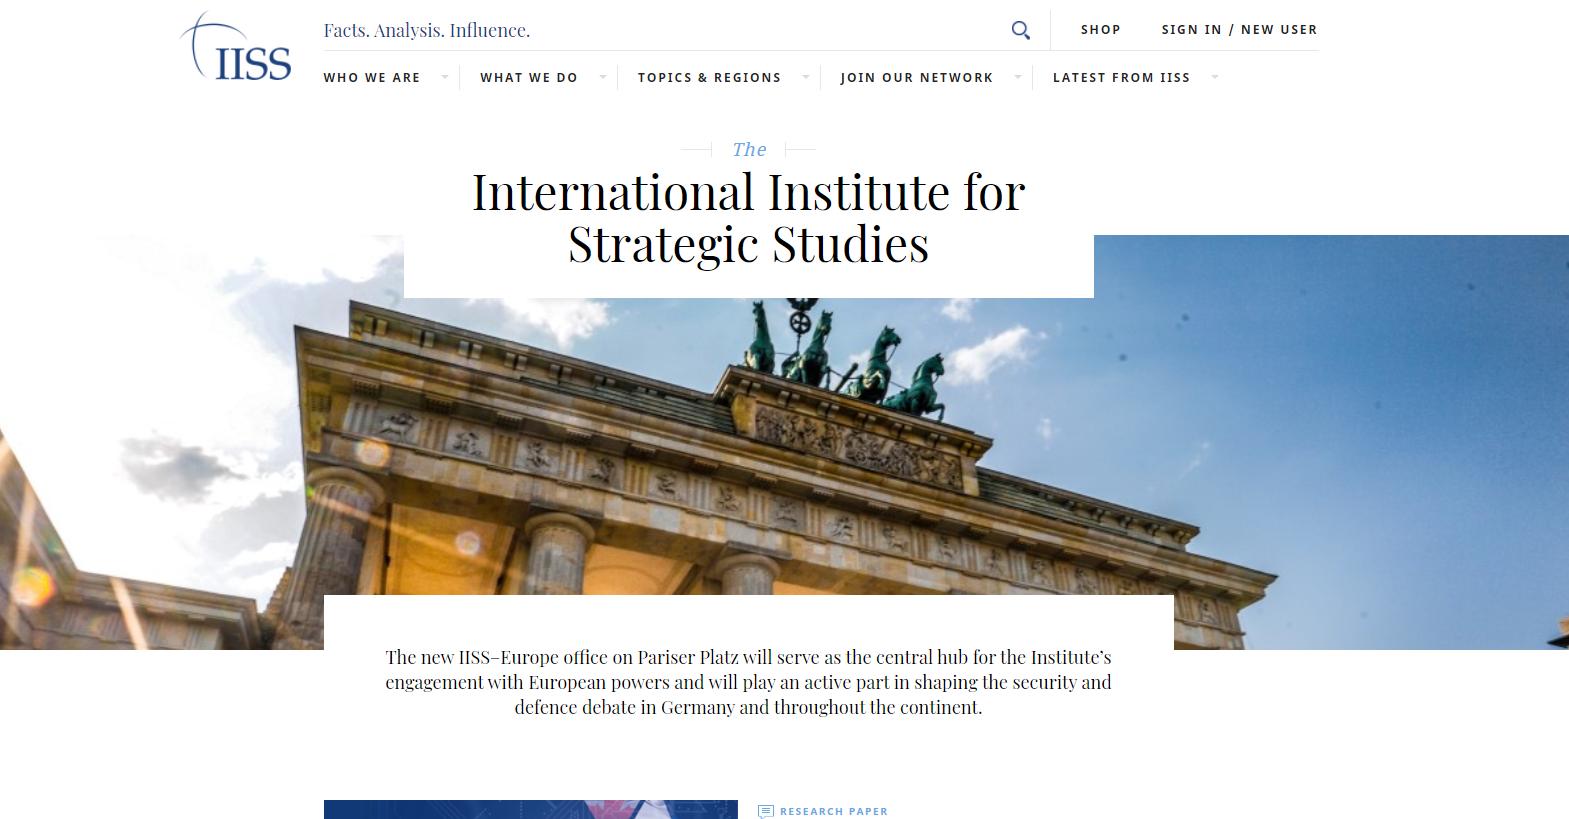 The International Institute for Strategic Studies